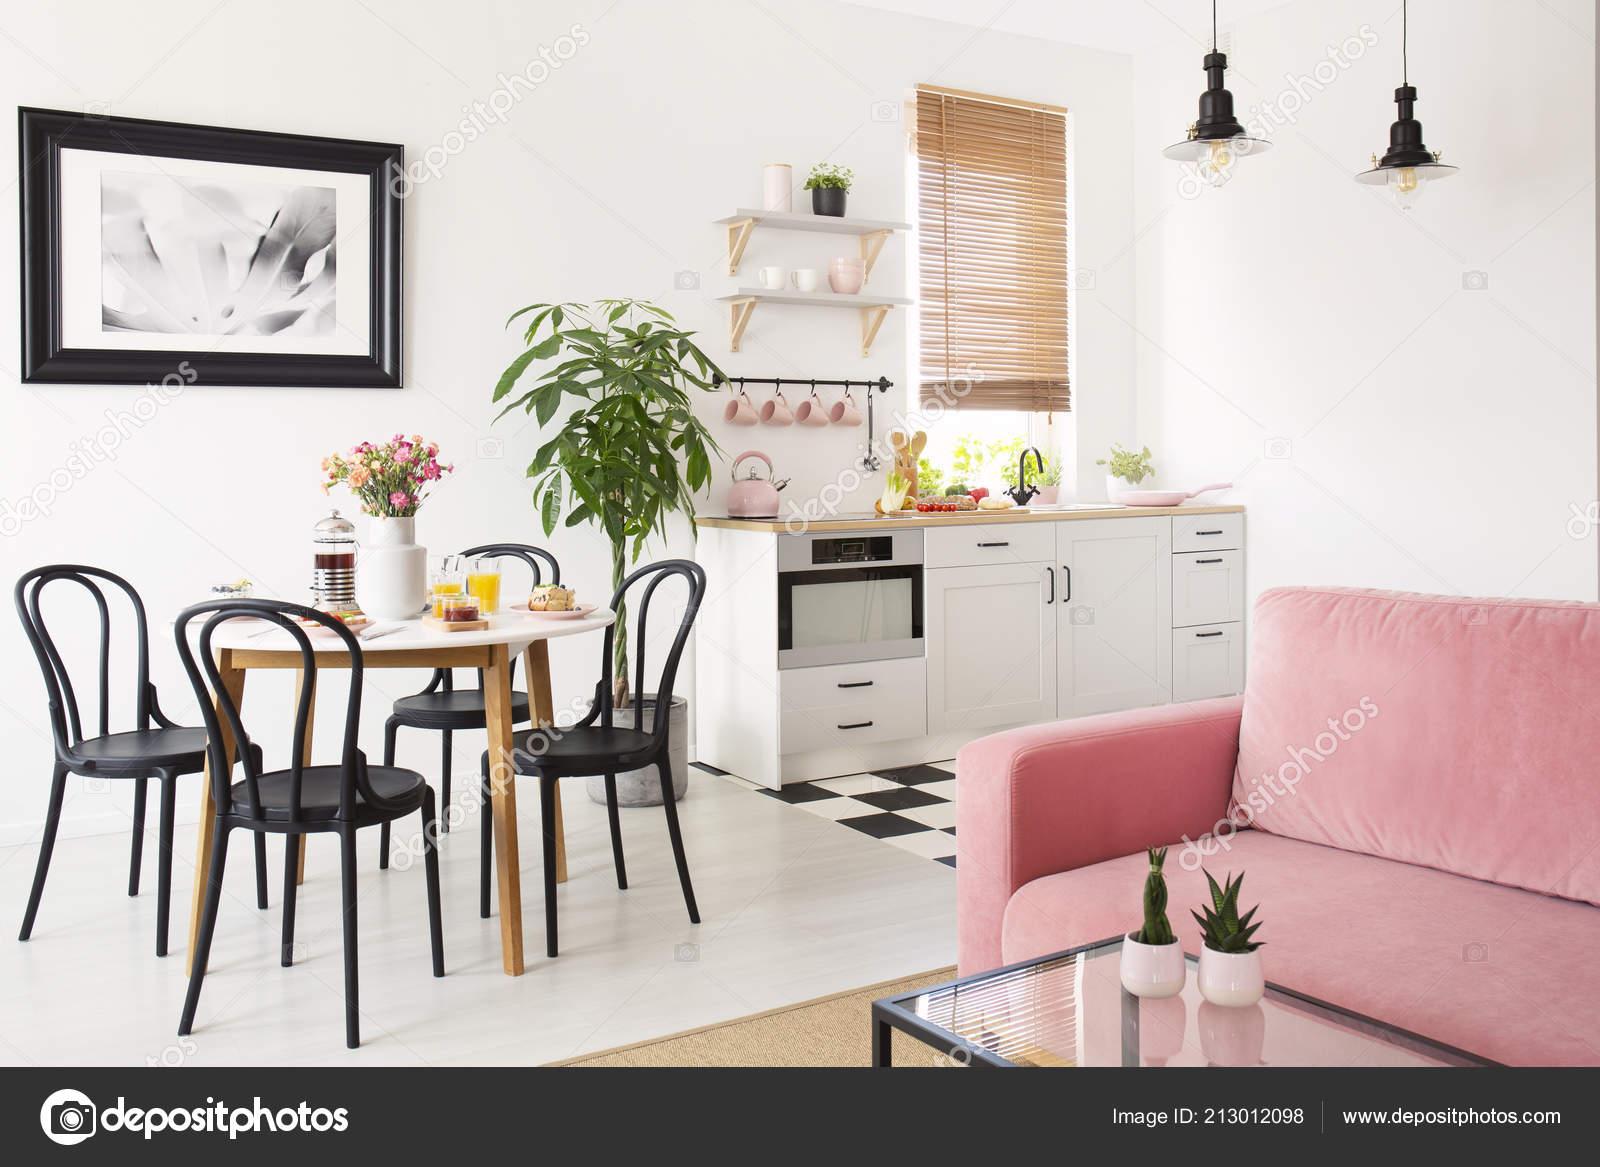 Pink Sofa White Apartment Interior Kitchenette Black Chairs